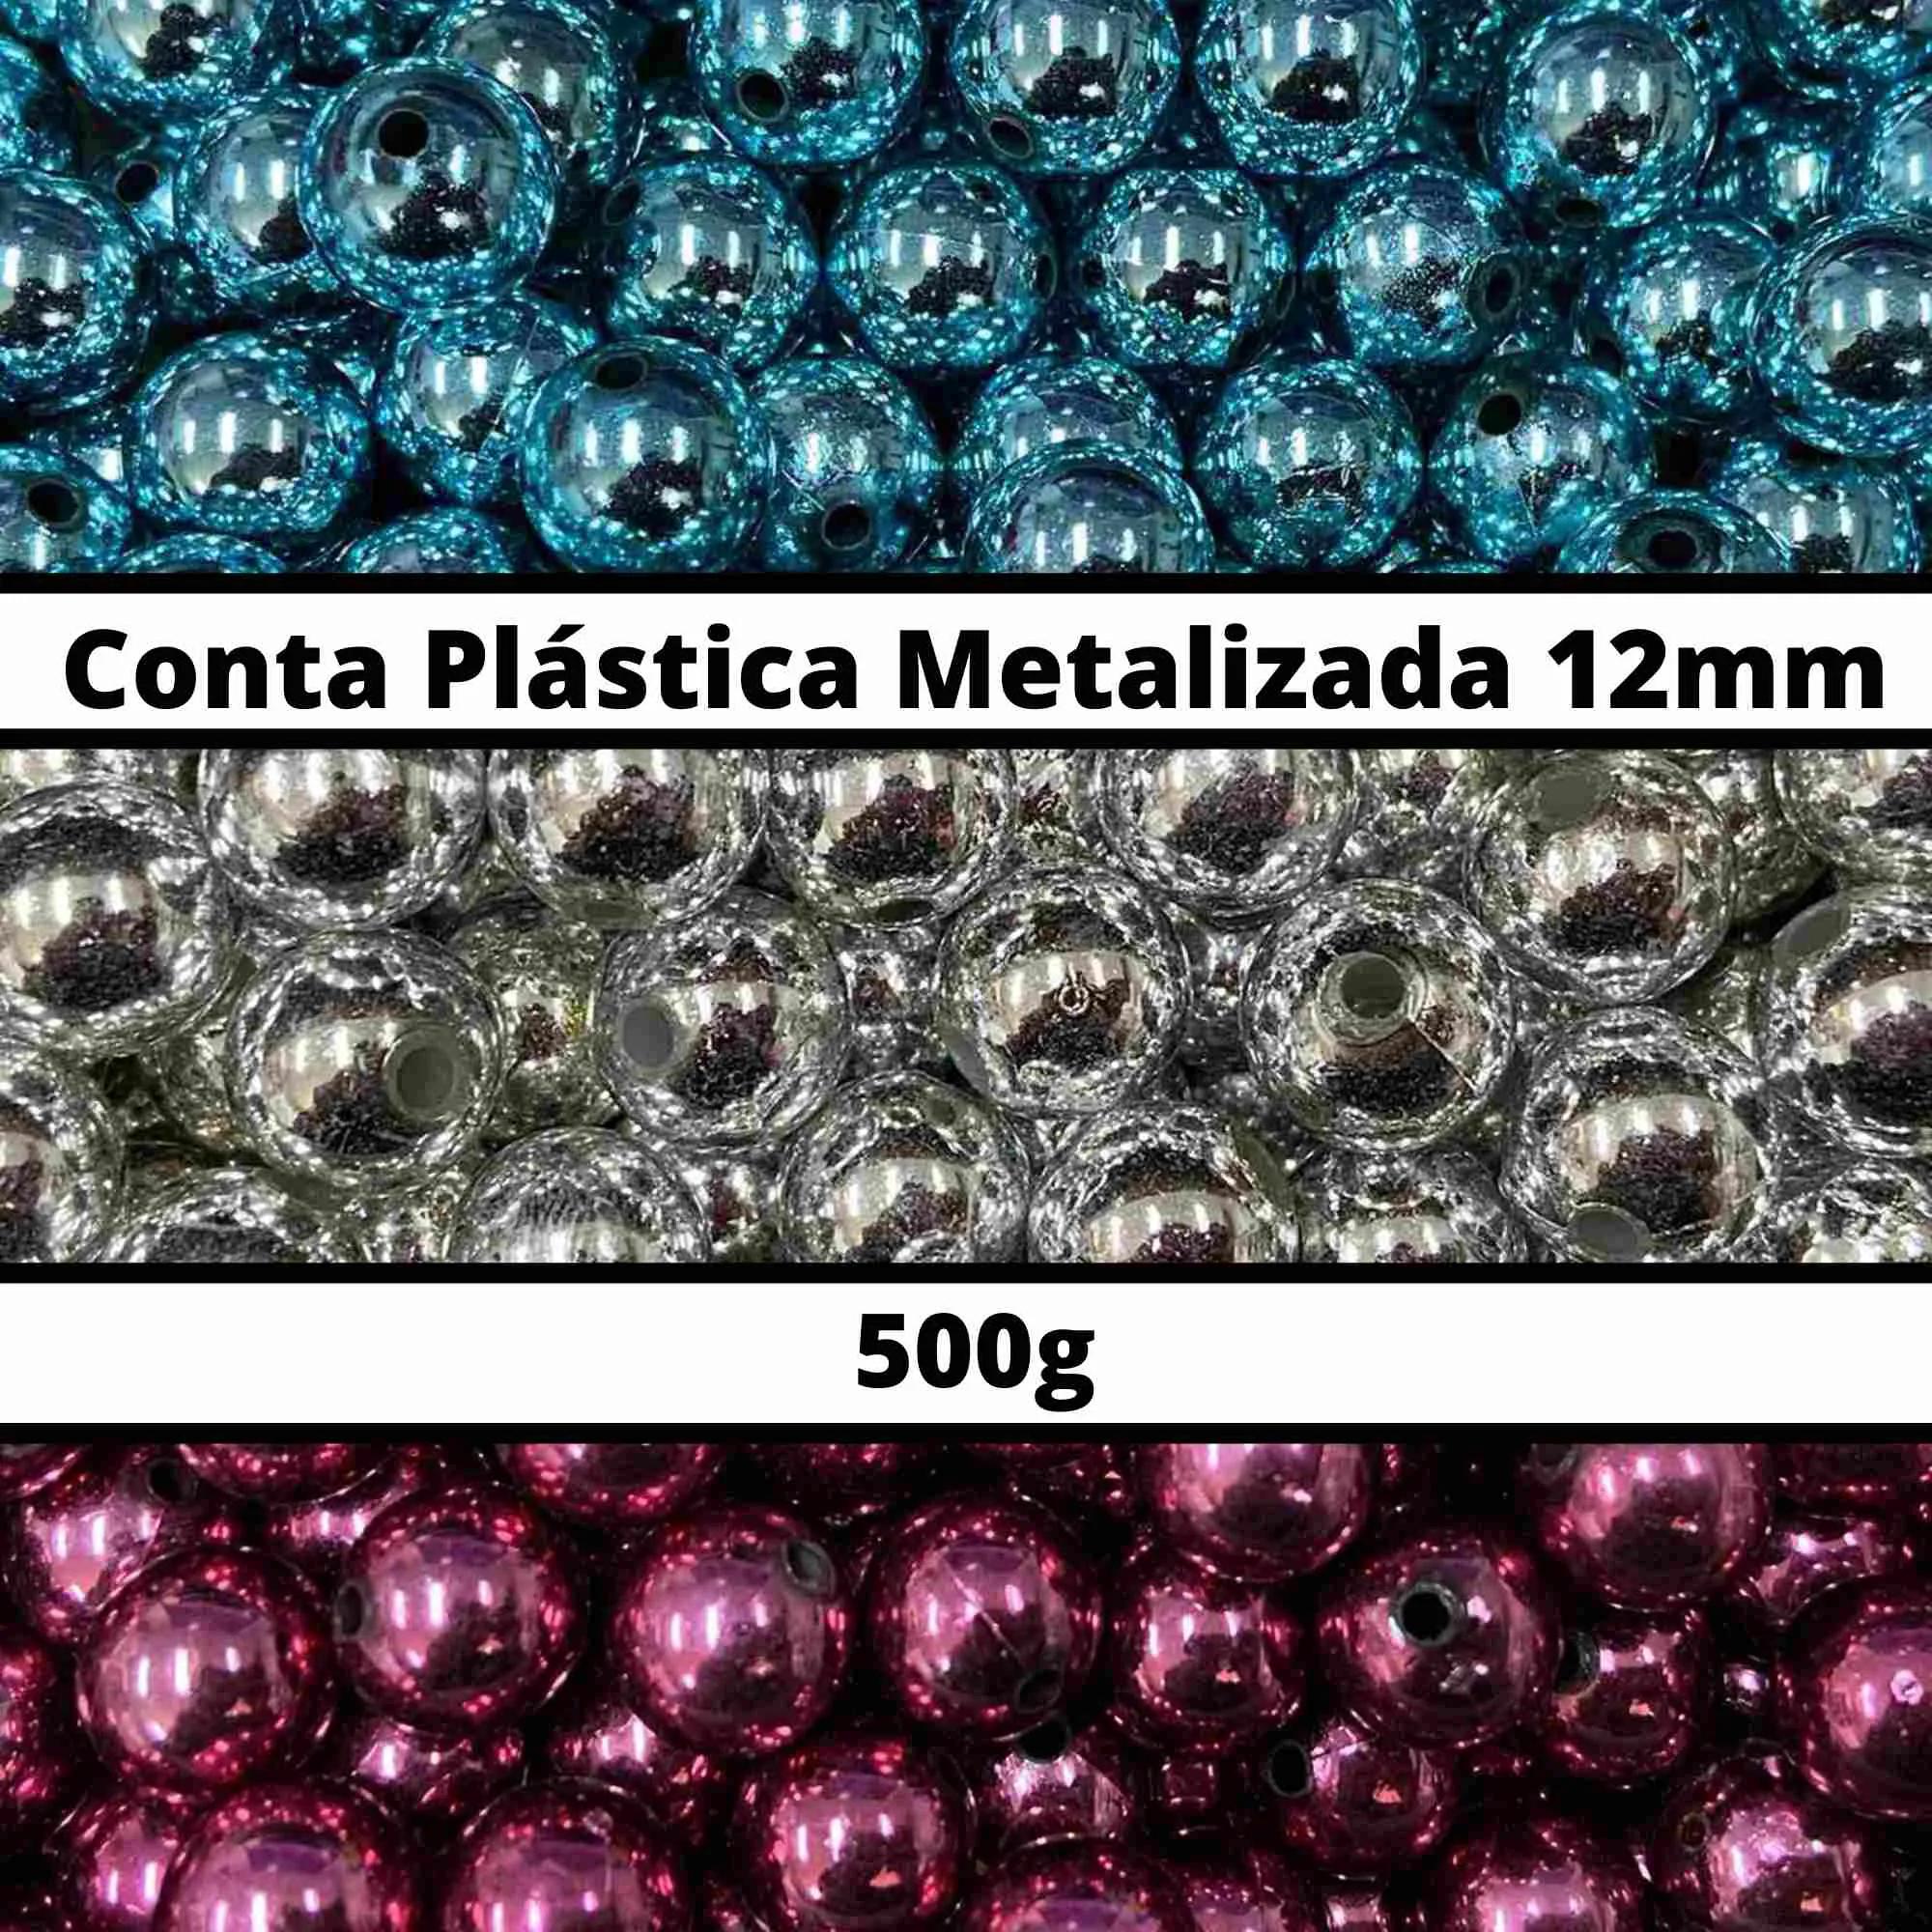 Conta Plástica Metalizada 12mm - 500g